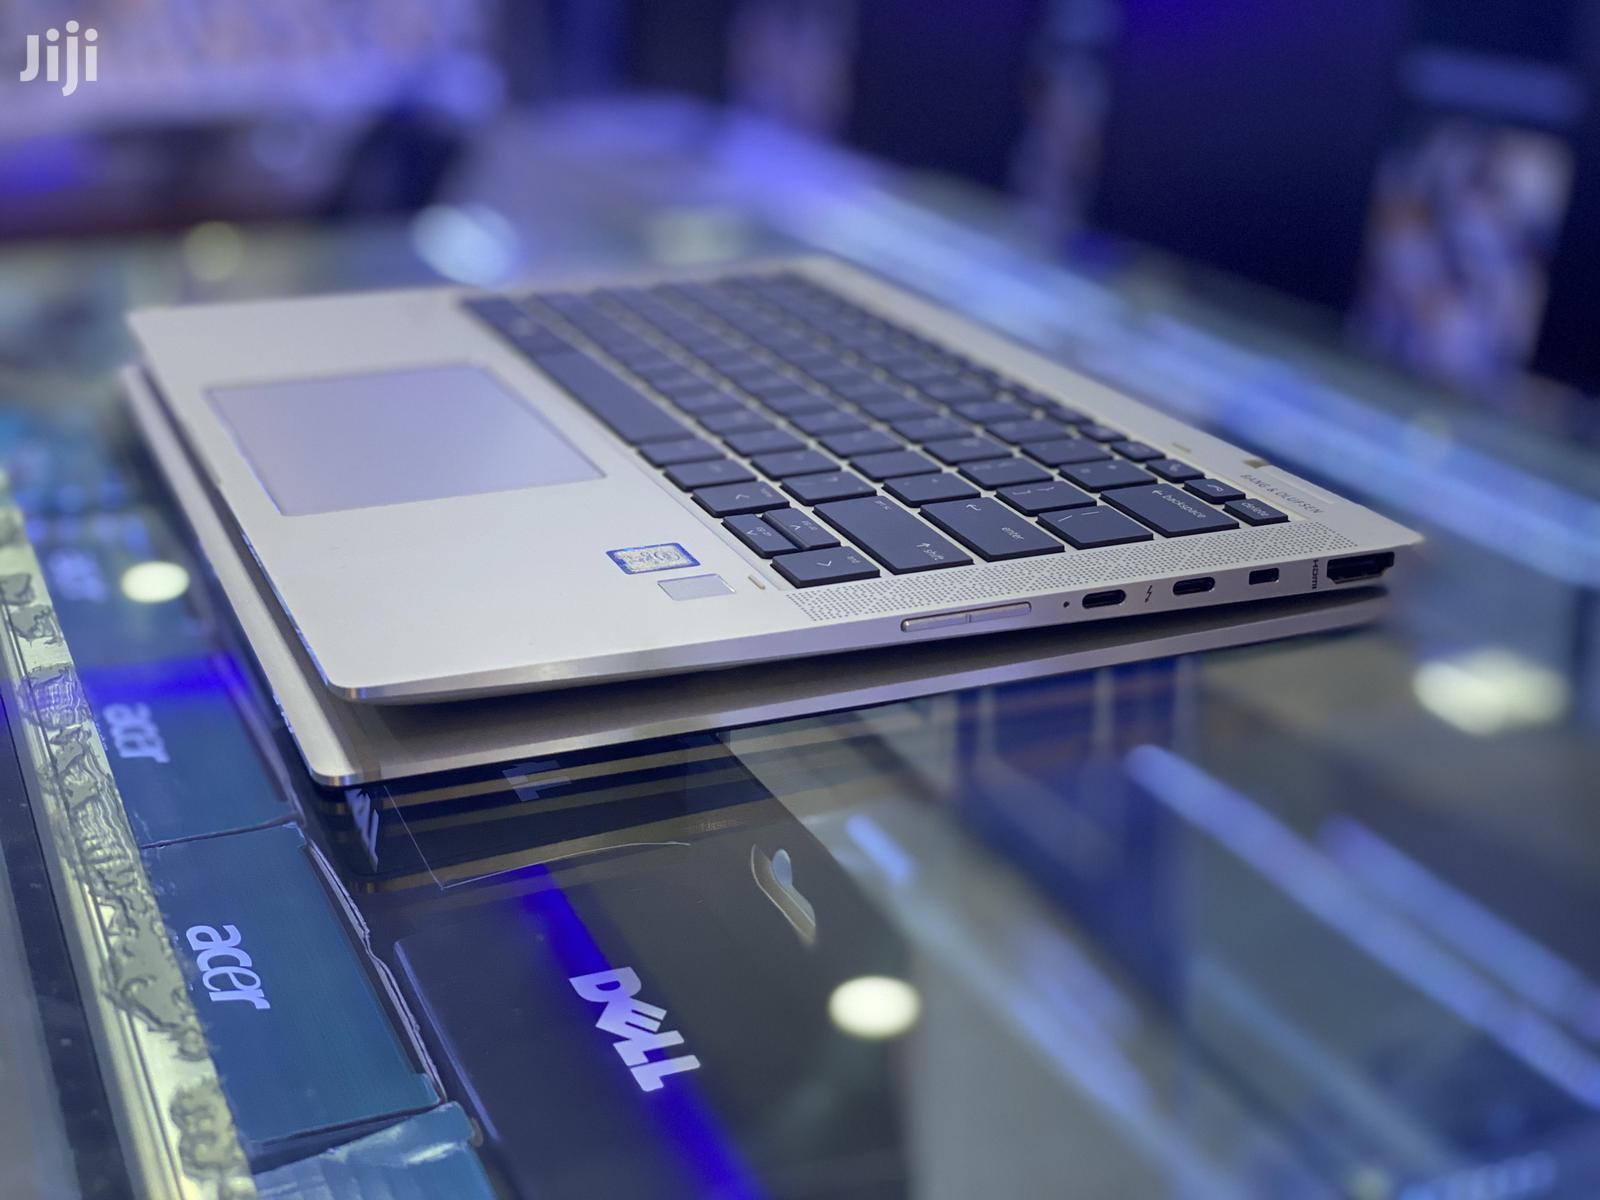 New Laptop Apple MacBook Pro 8GB Intel Core i5 SSHD (Hybrid) 256GB | Laptops & Computers for sale in Kampala, Central Region, Uganda